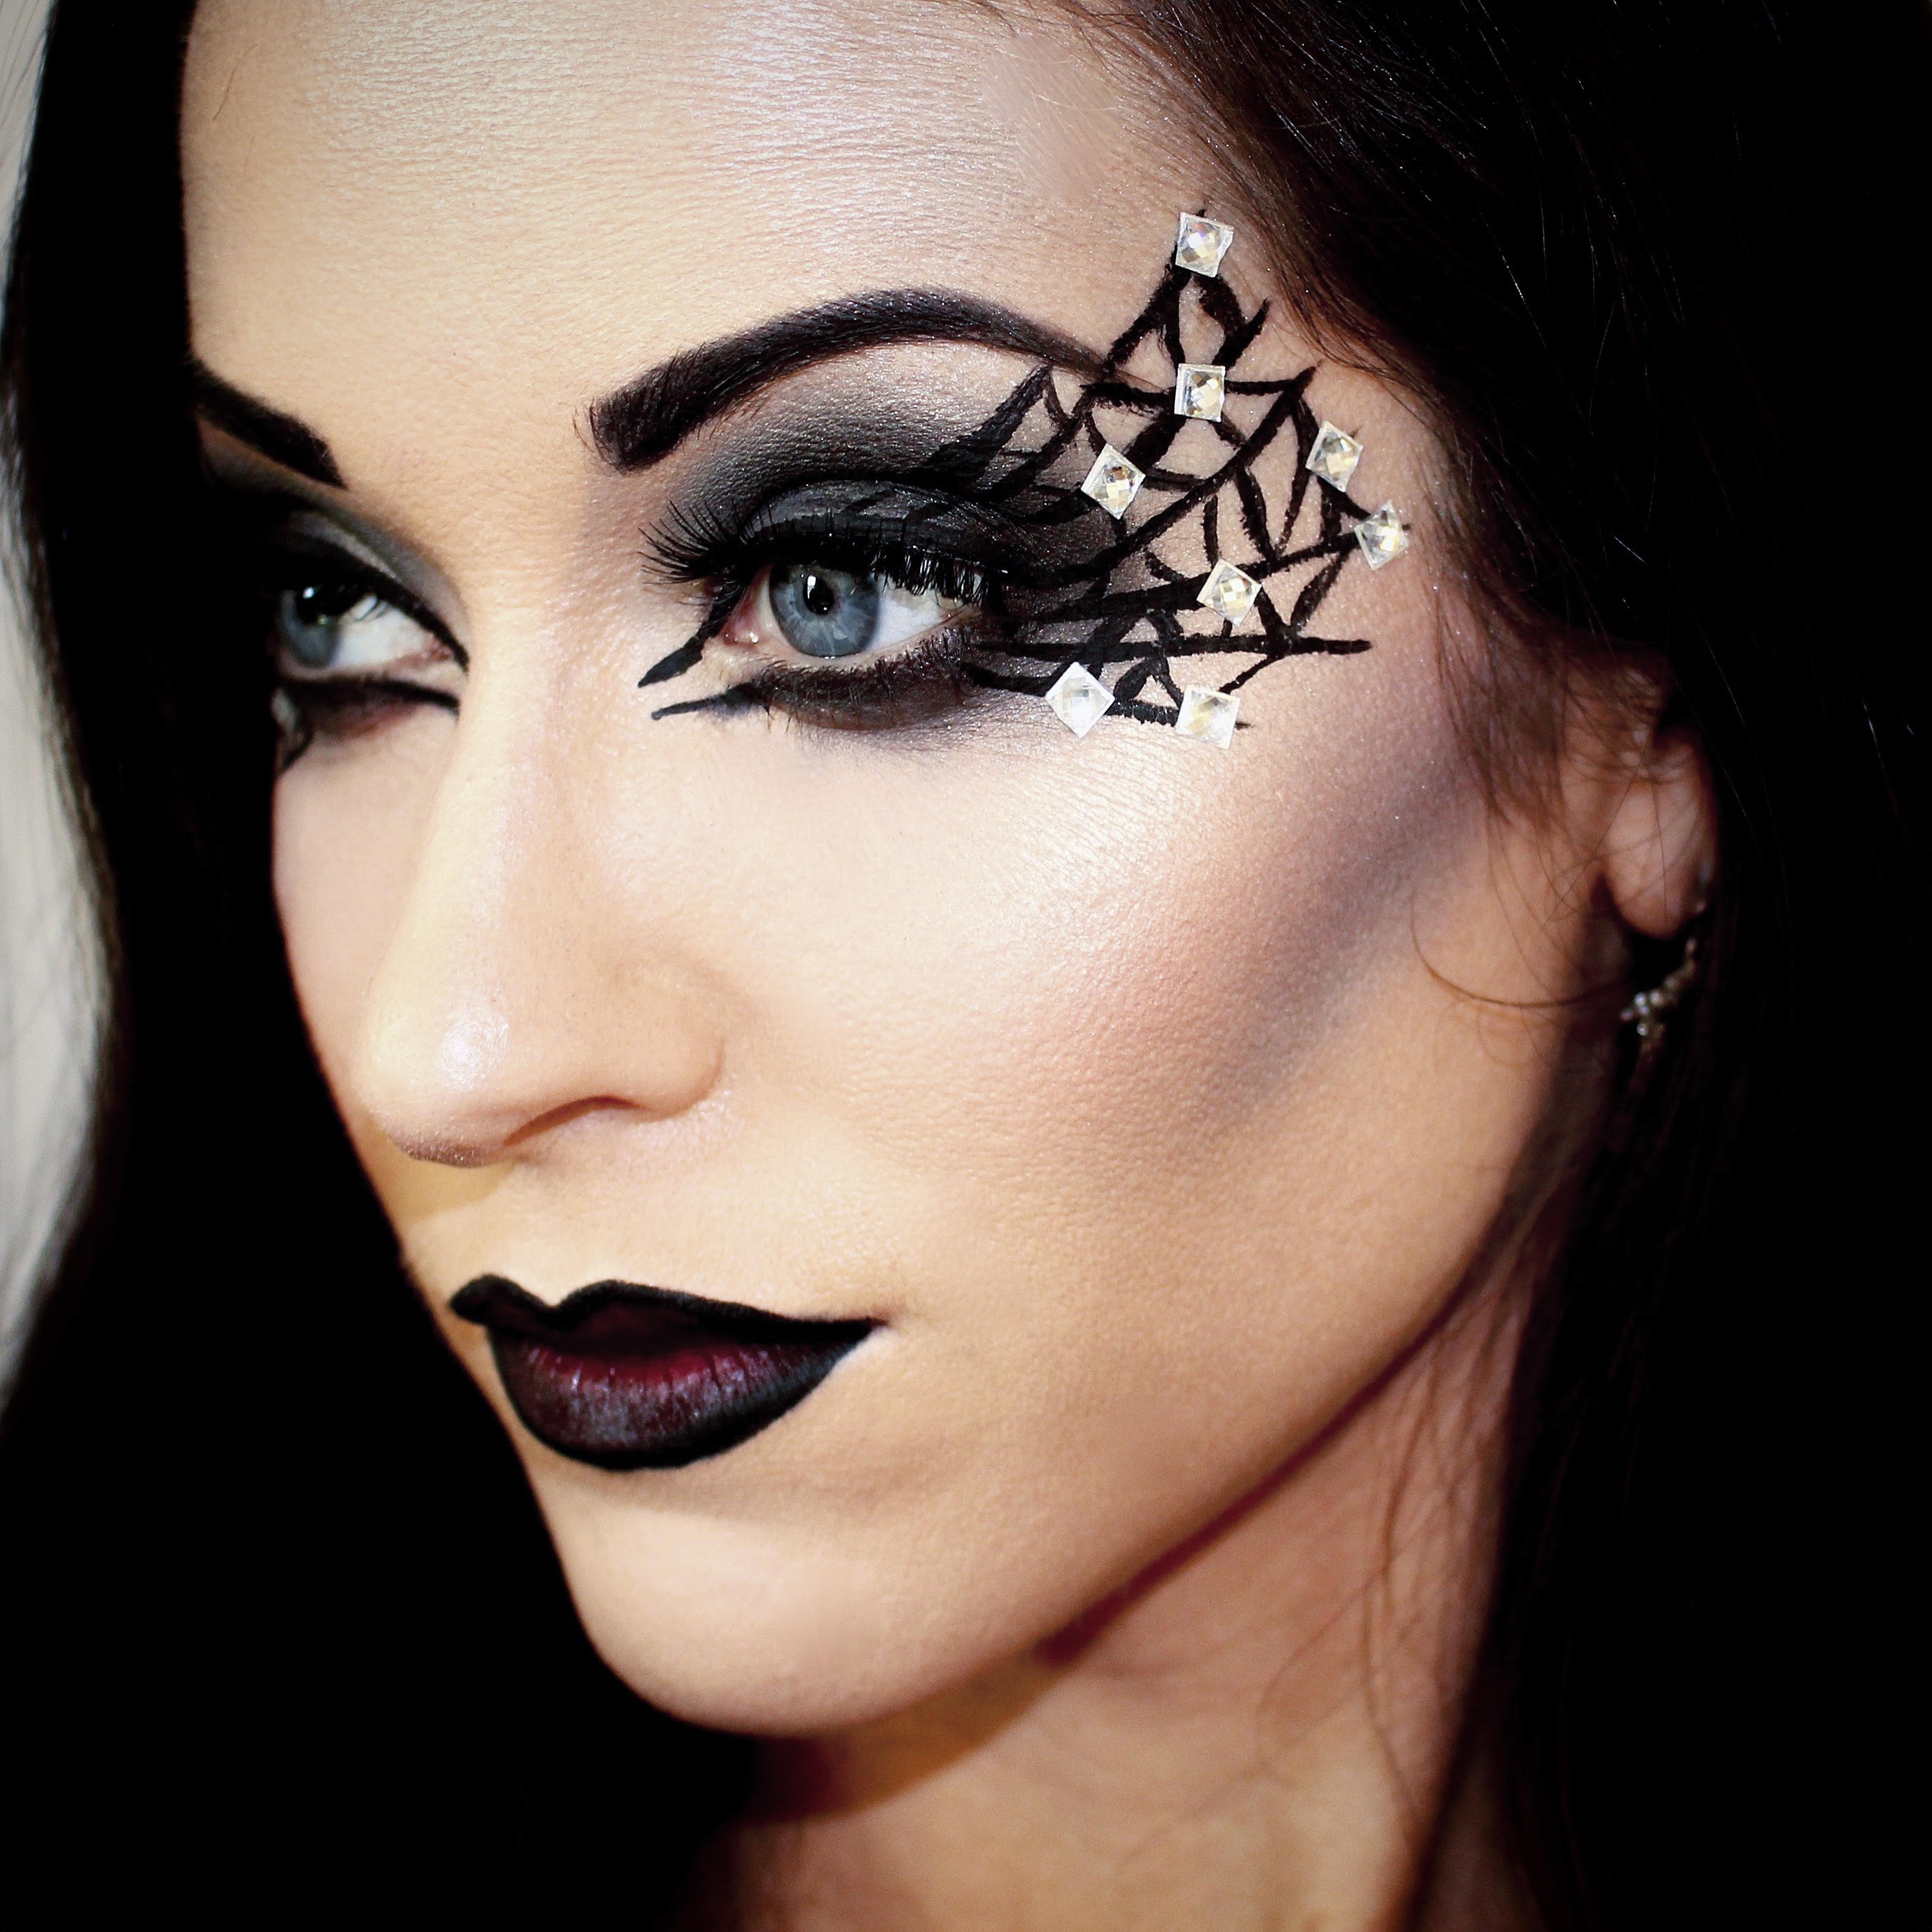 witches makeup how to do it makeup vidalondon